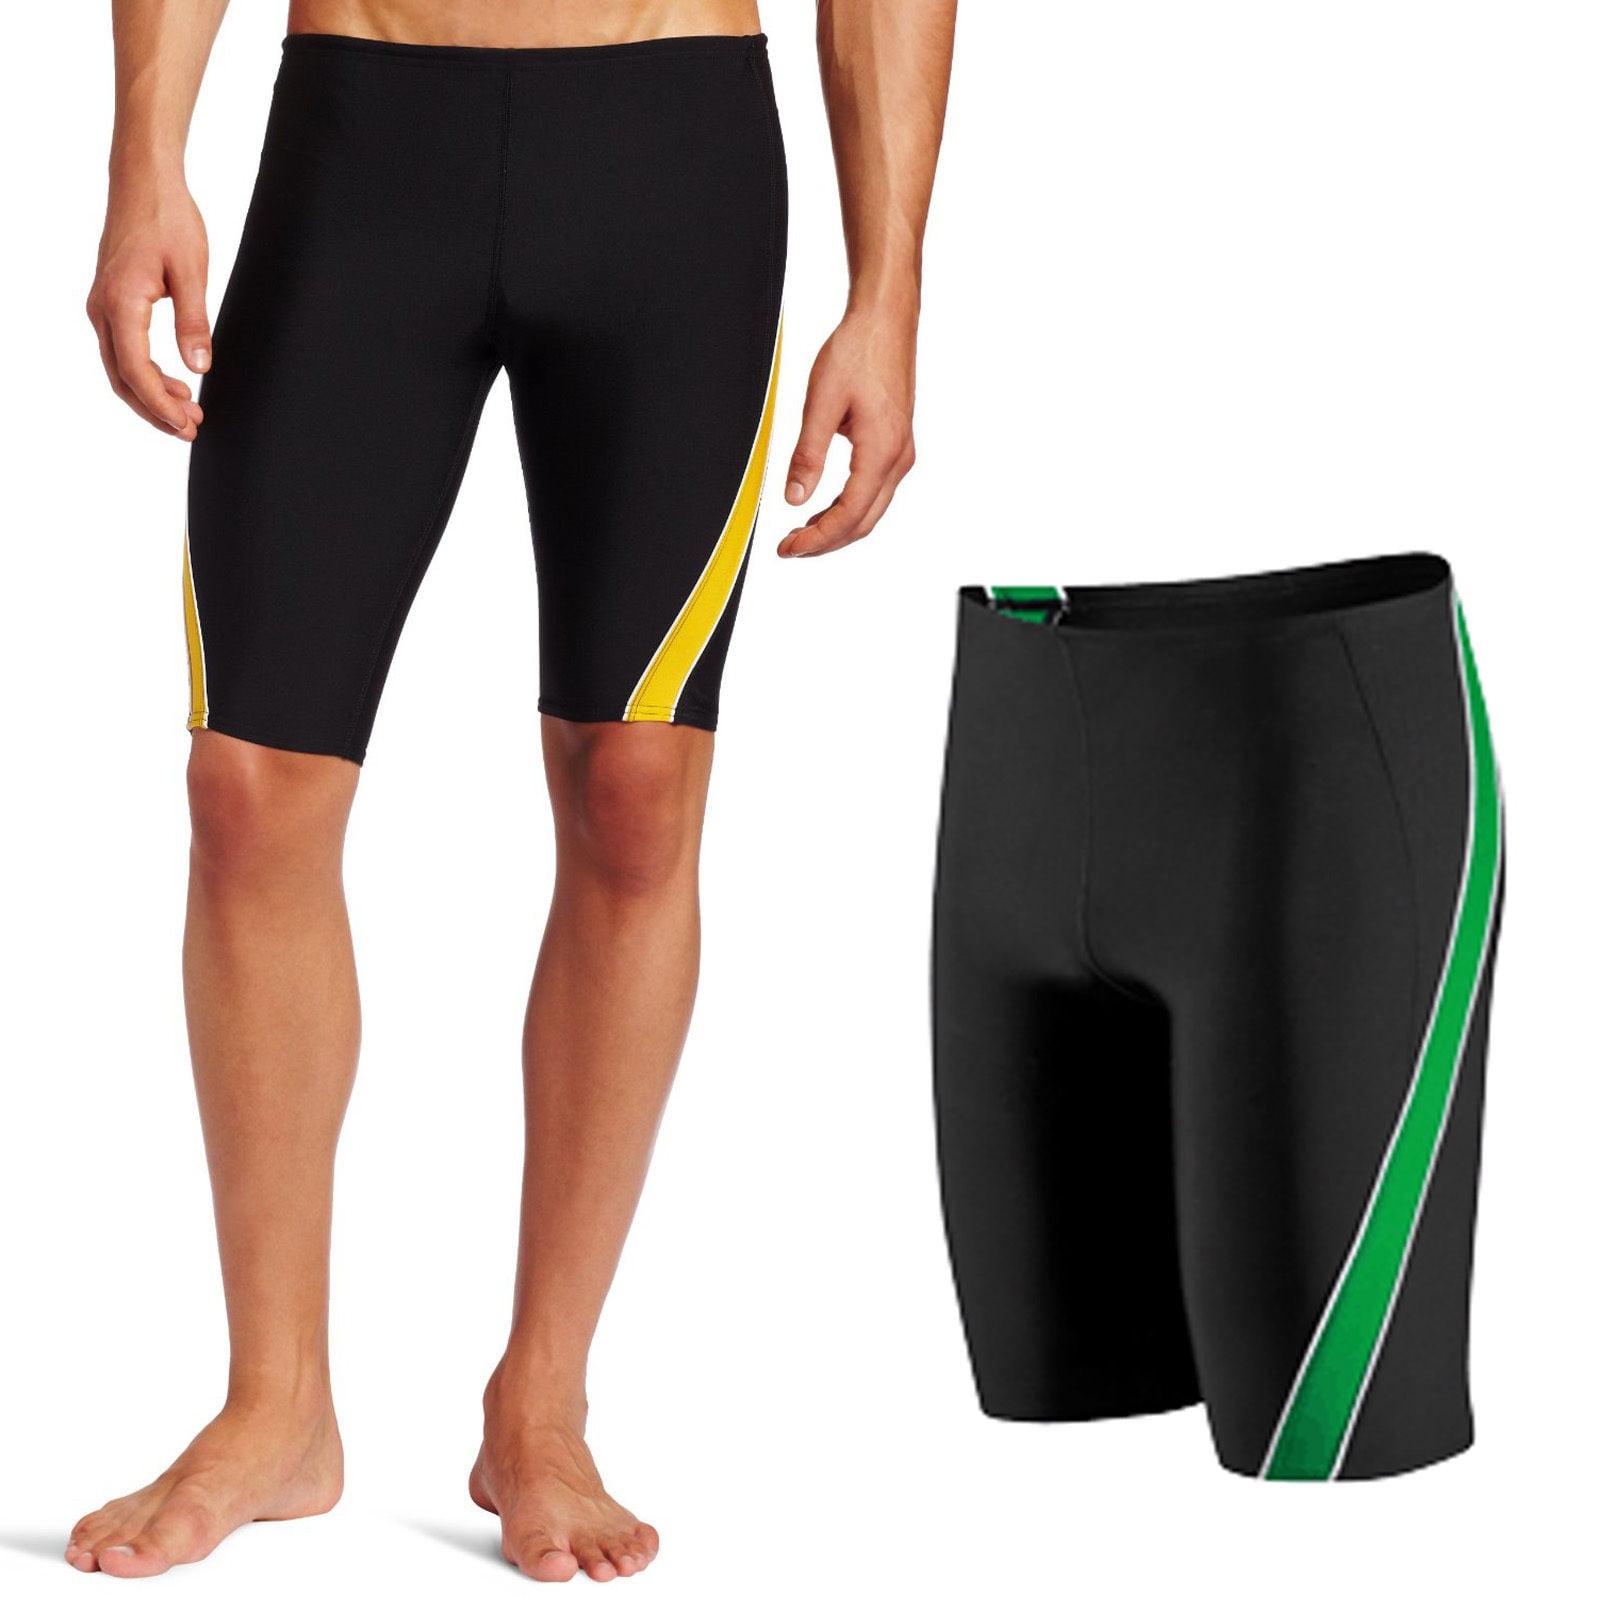 Speedo Men's Endurance+ Mercury Splice Swimsuit Trunk Jammer 8051224